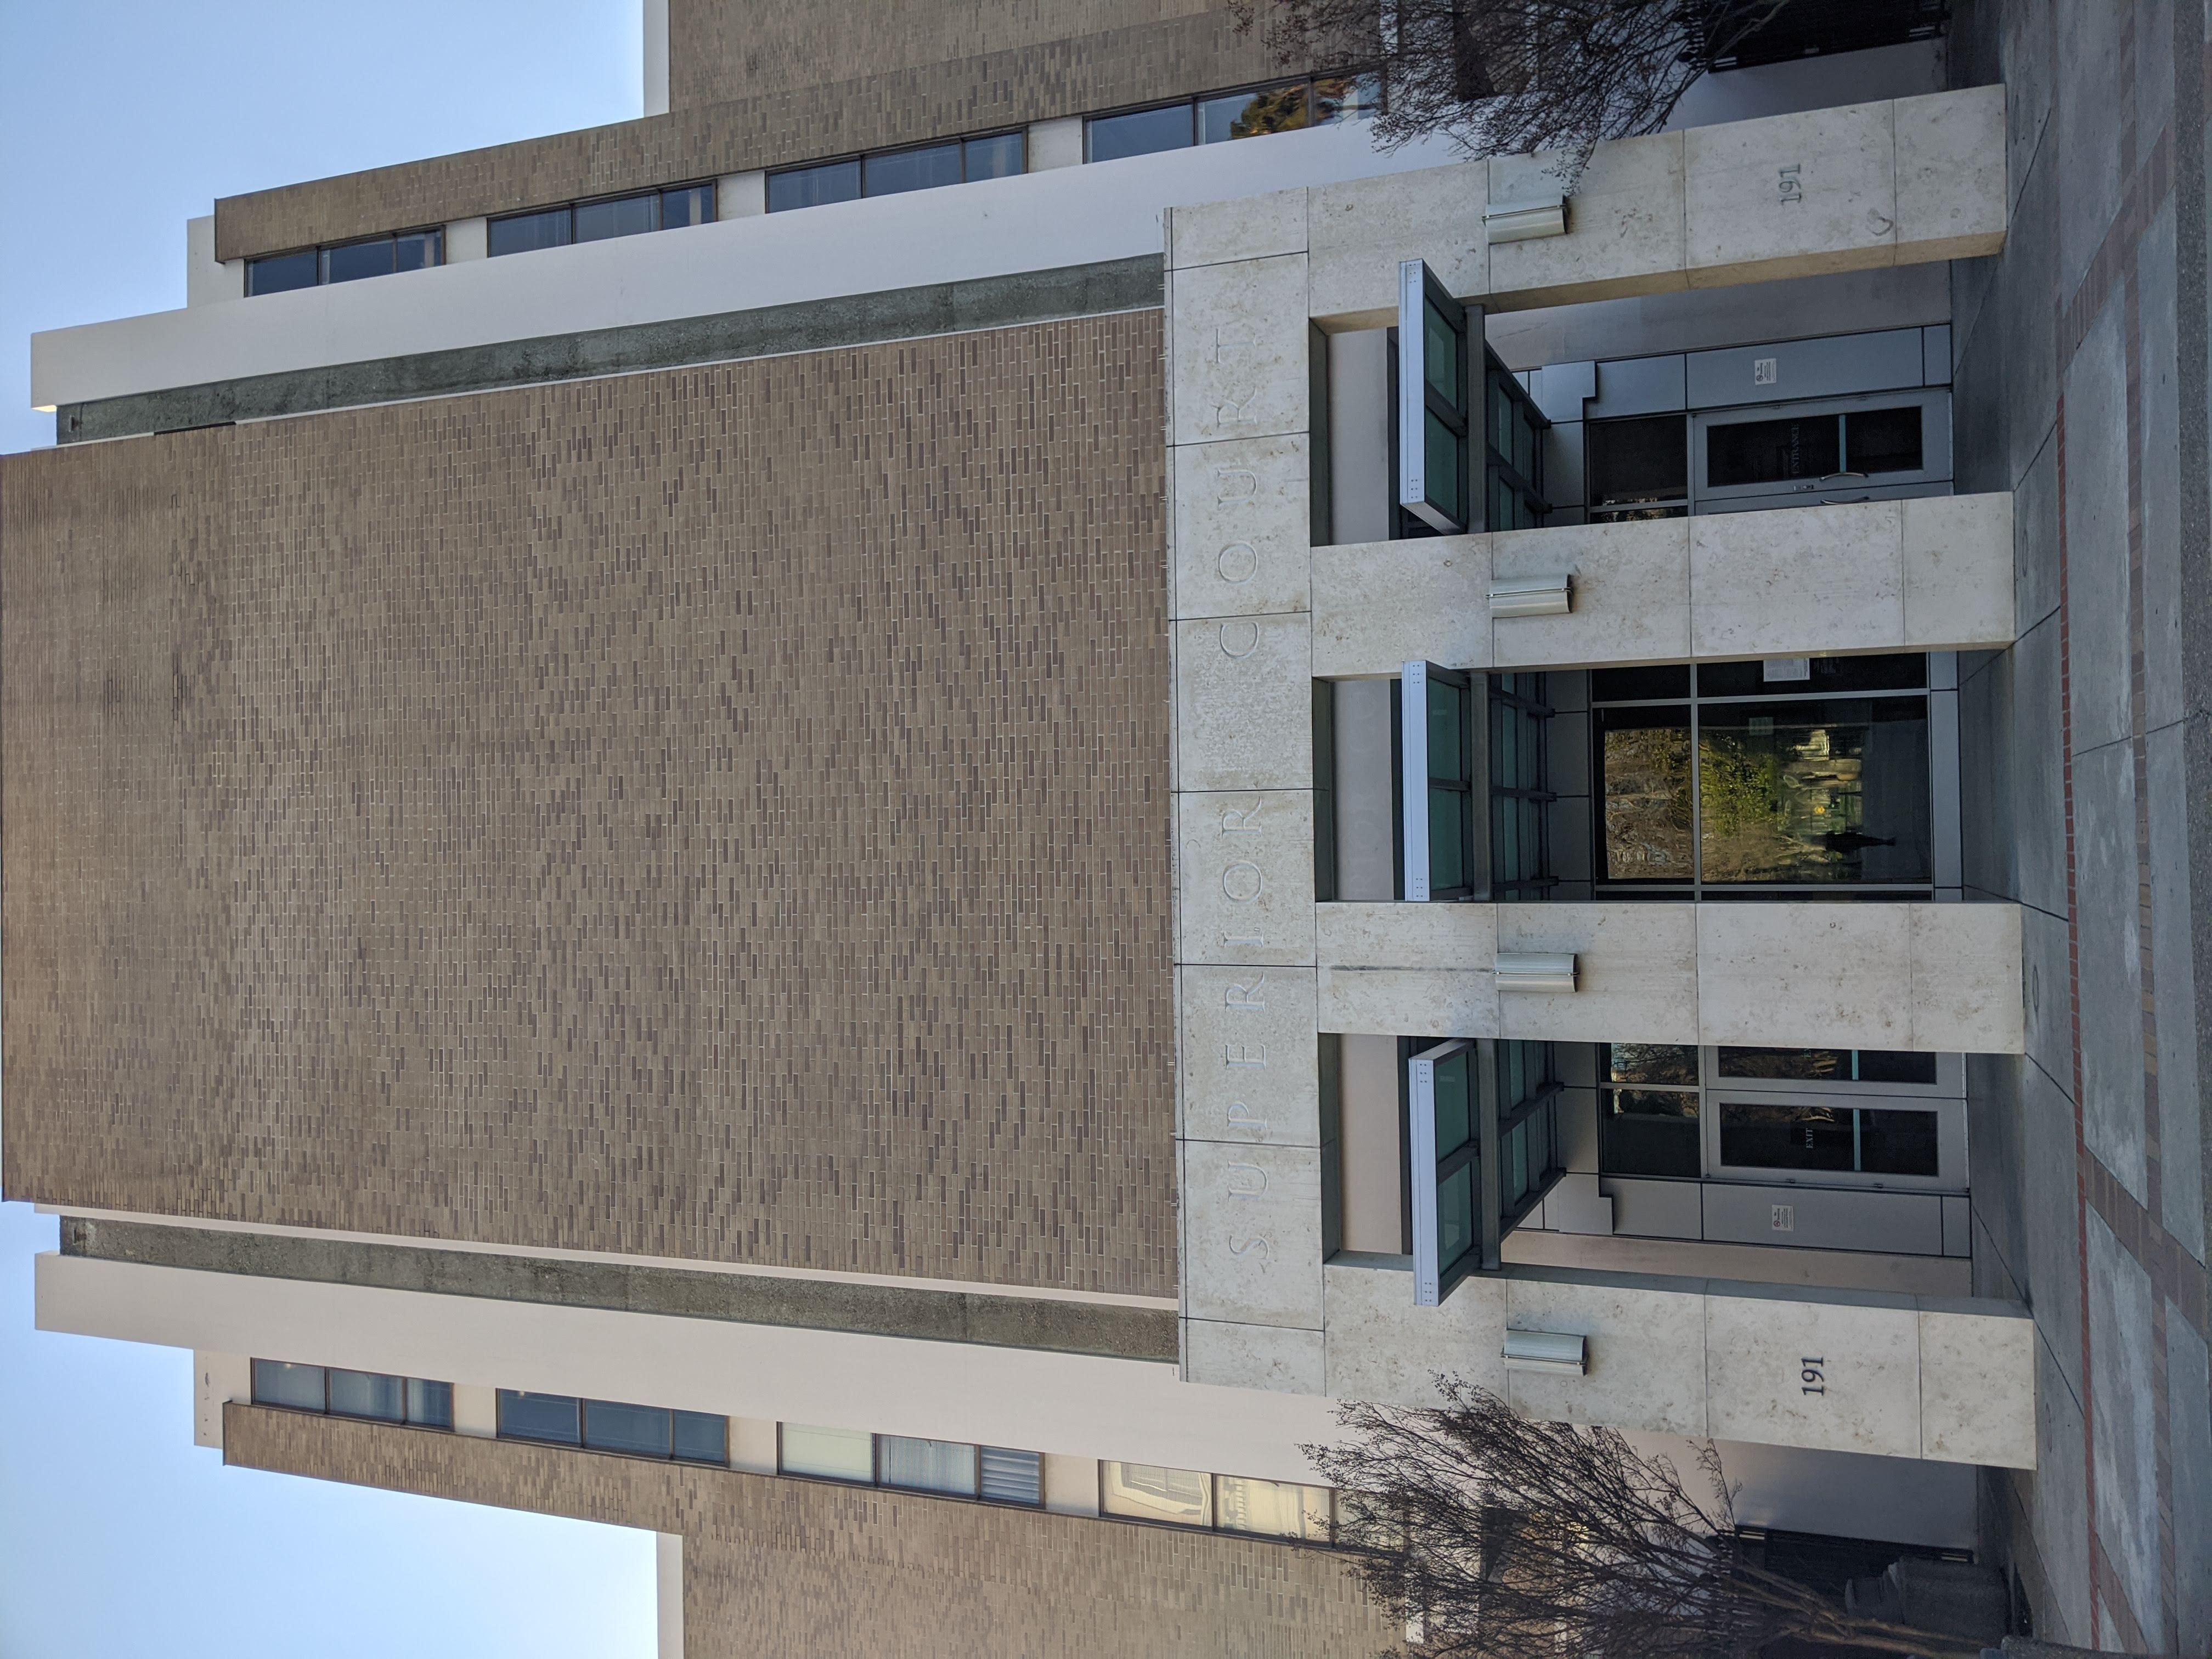 San Jose Courthouse